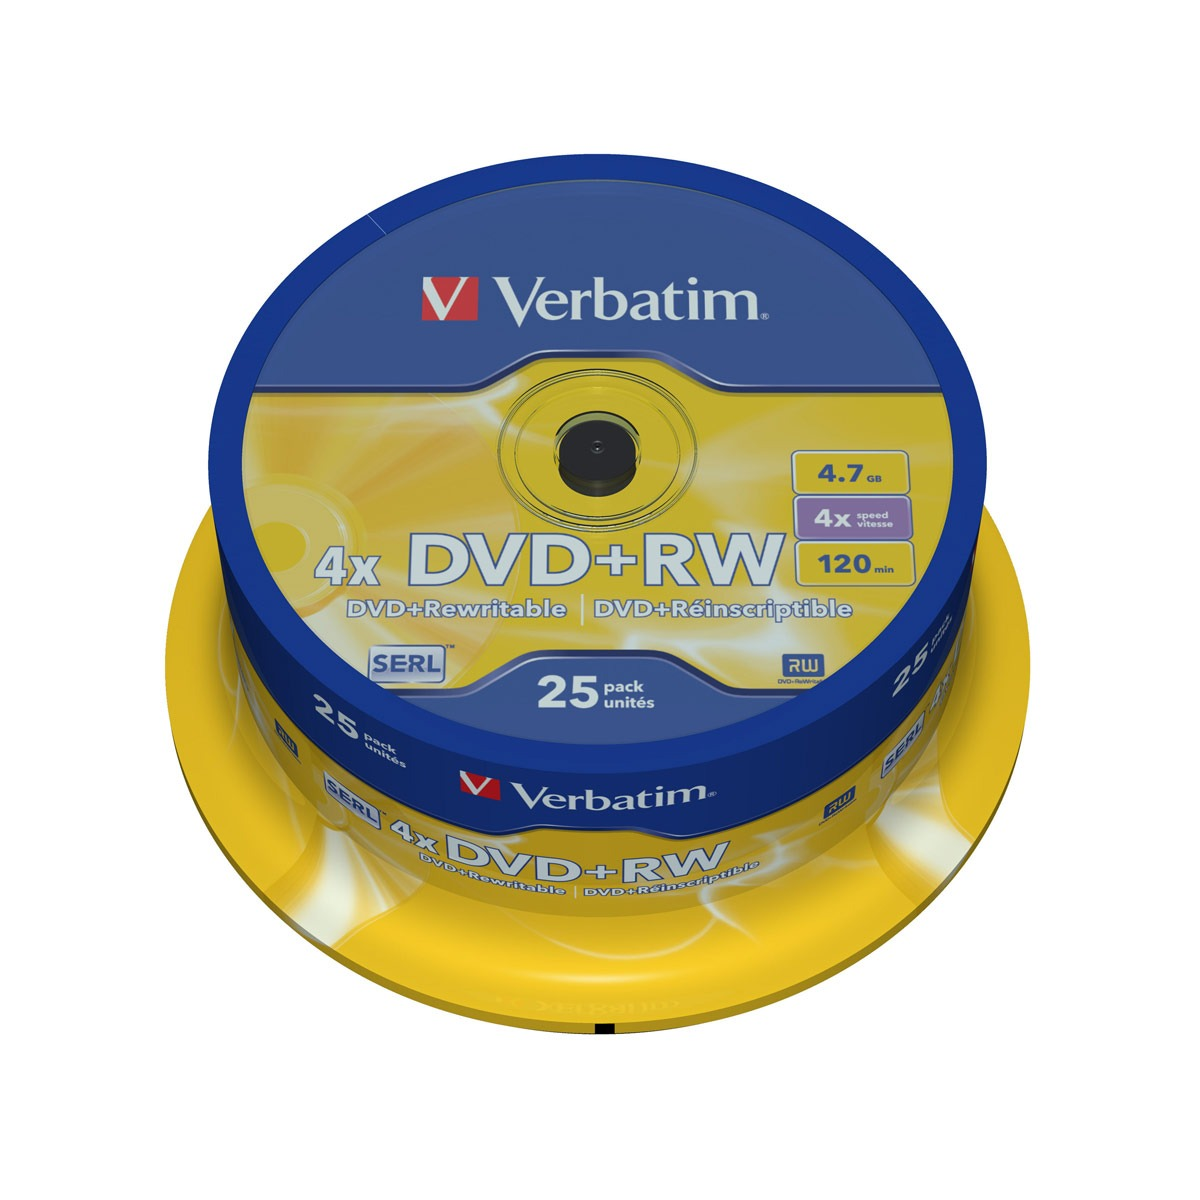 DVD Verbatim DVD+RW 4.7 Go certifié 4x (pack de 25, spindle) Verbatim DVD+RW 4.7 Go certifié 4x (pack de 25, spindle)